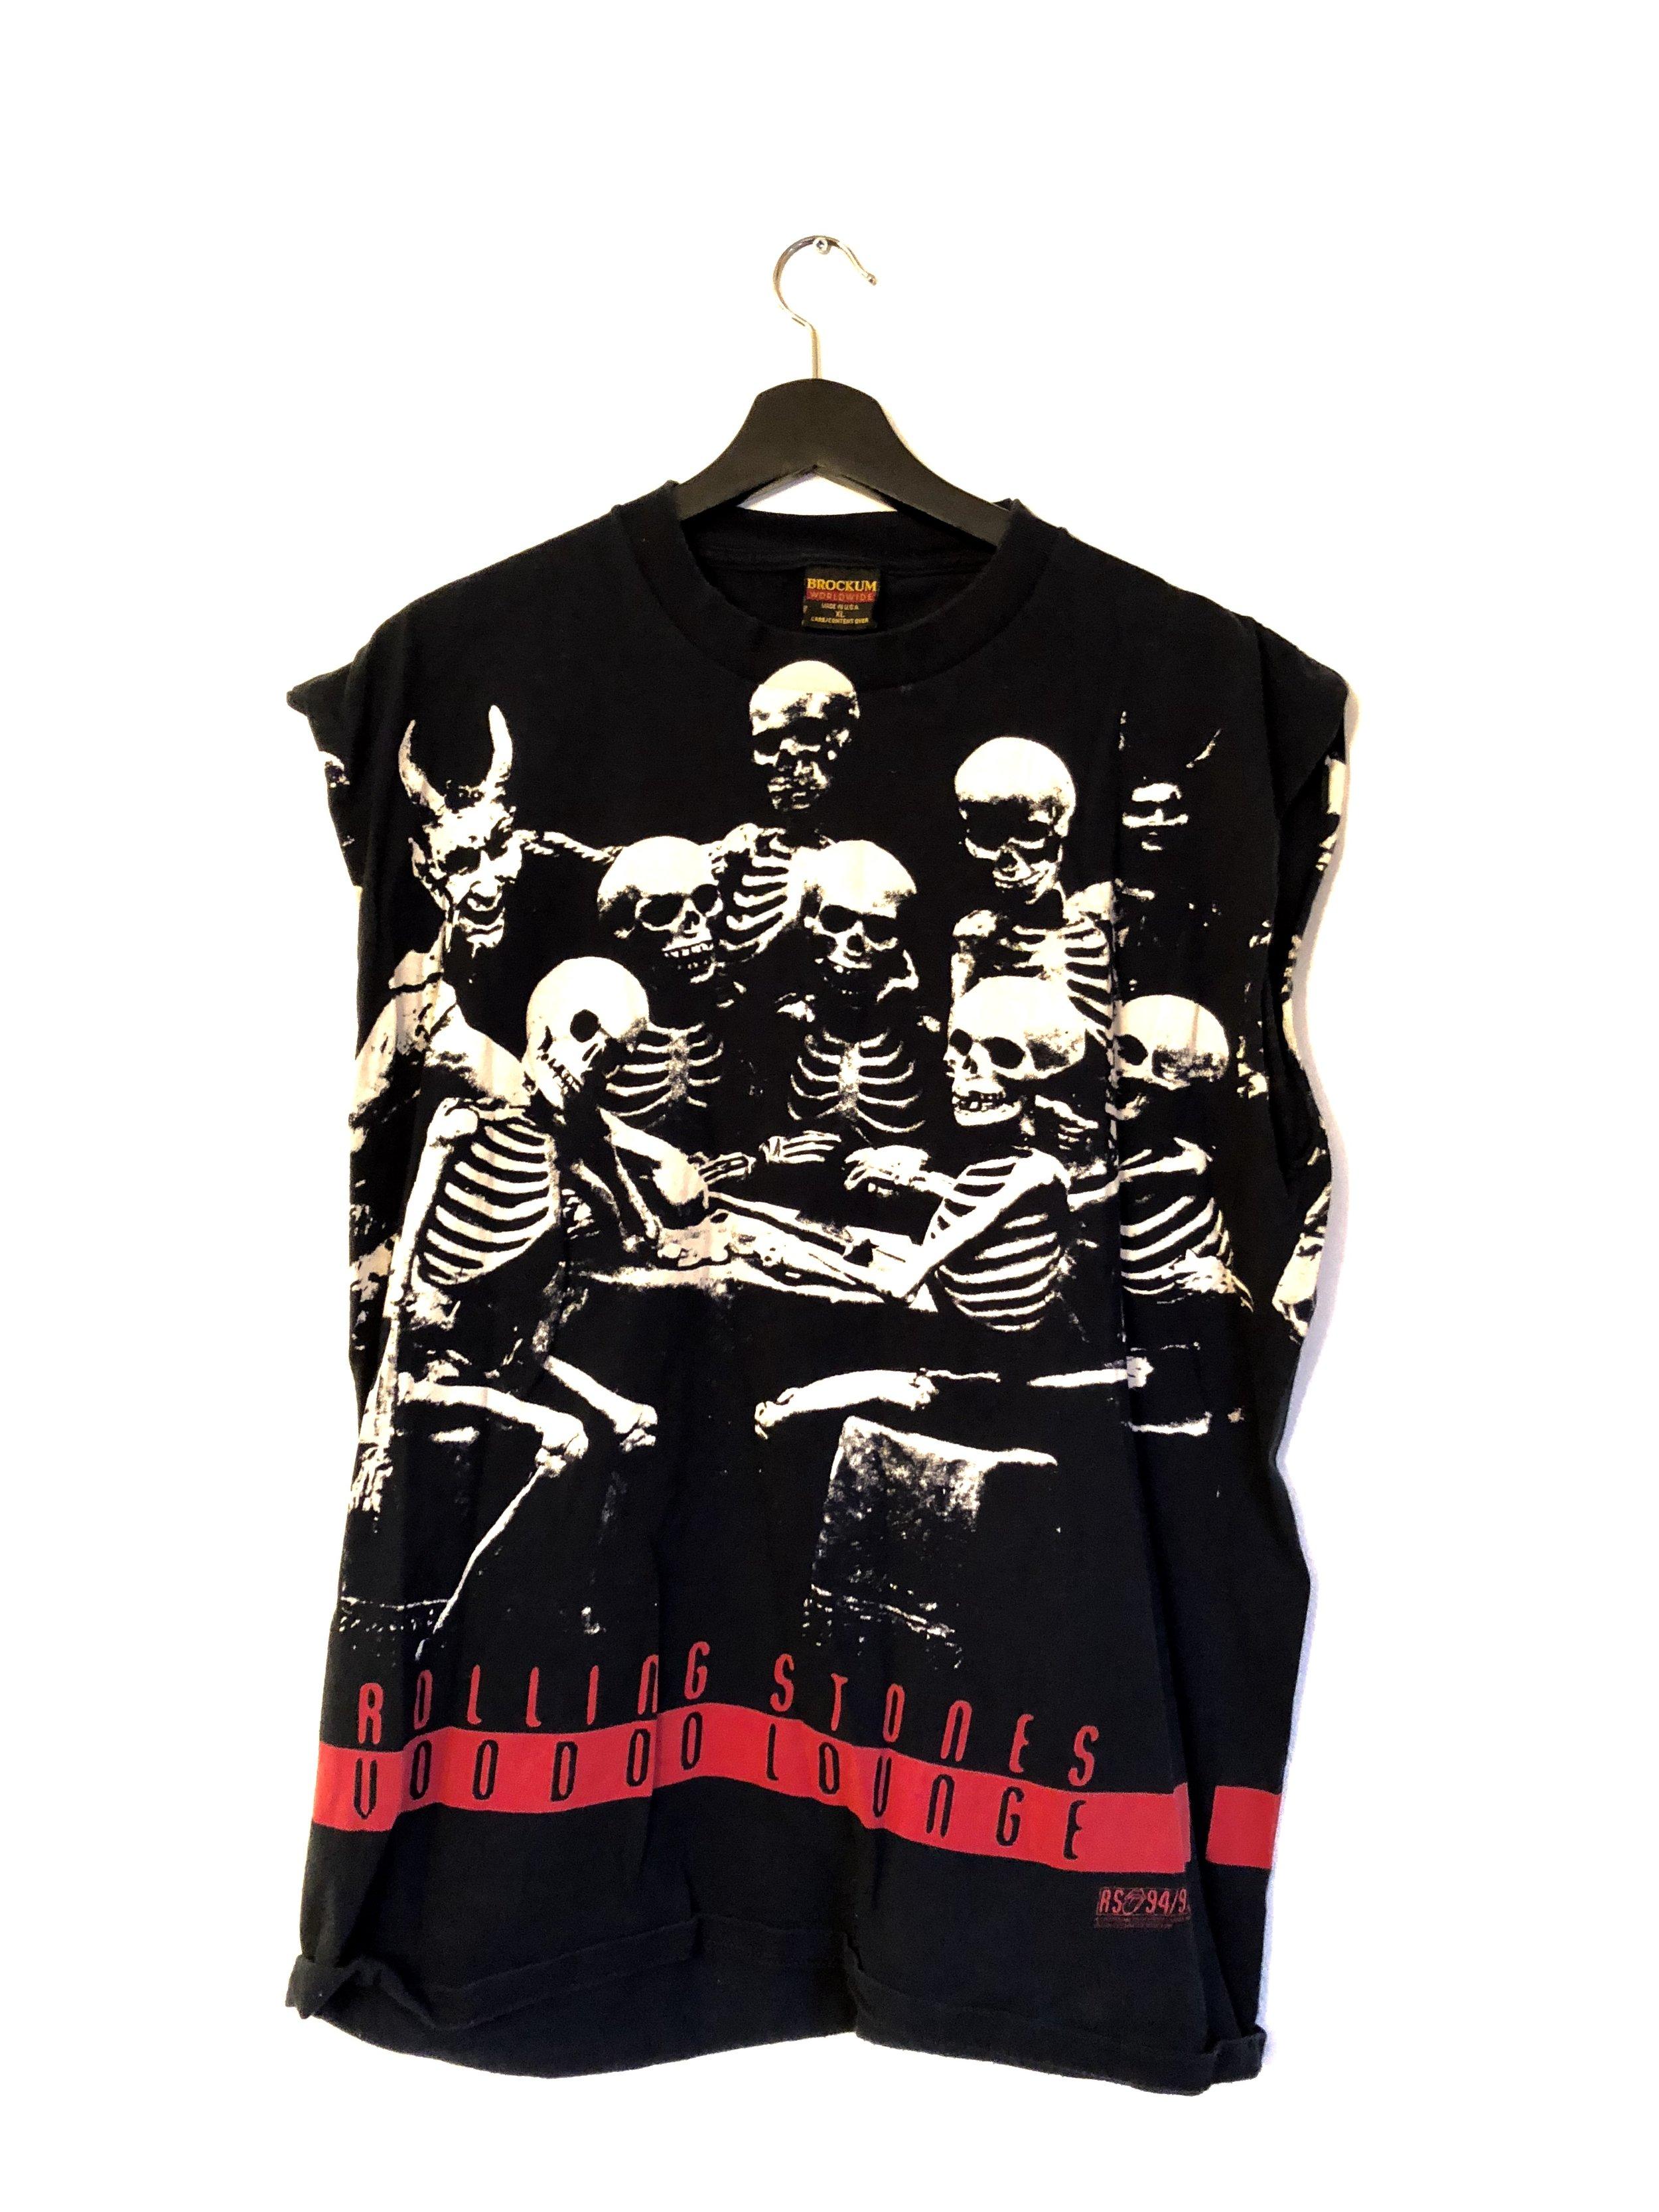 991b697eb4c4 Authentic Vintage Rolling Stones Voodoo Lounge T-Shirt — Glorydays ...